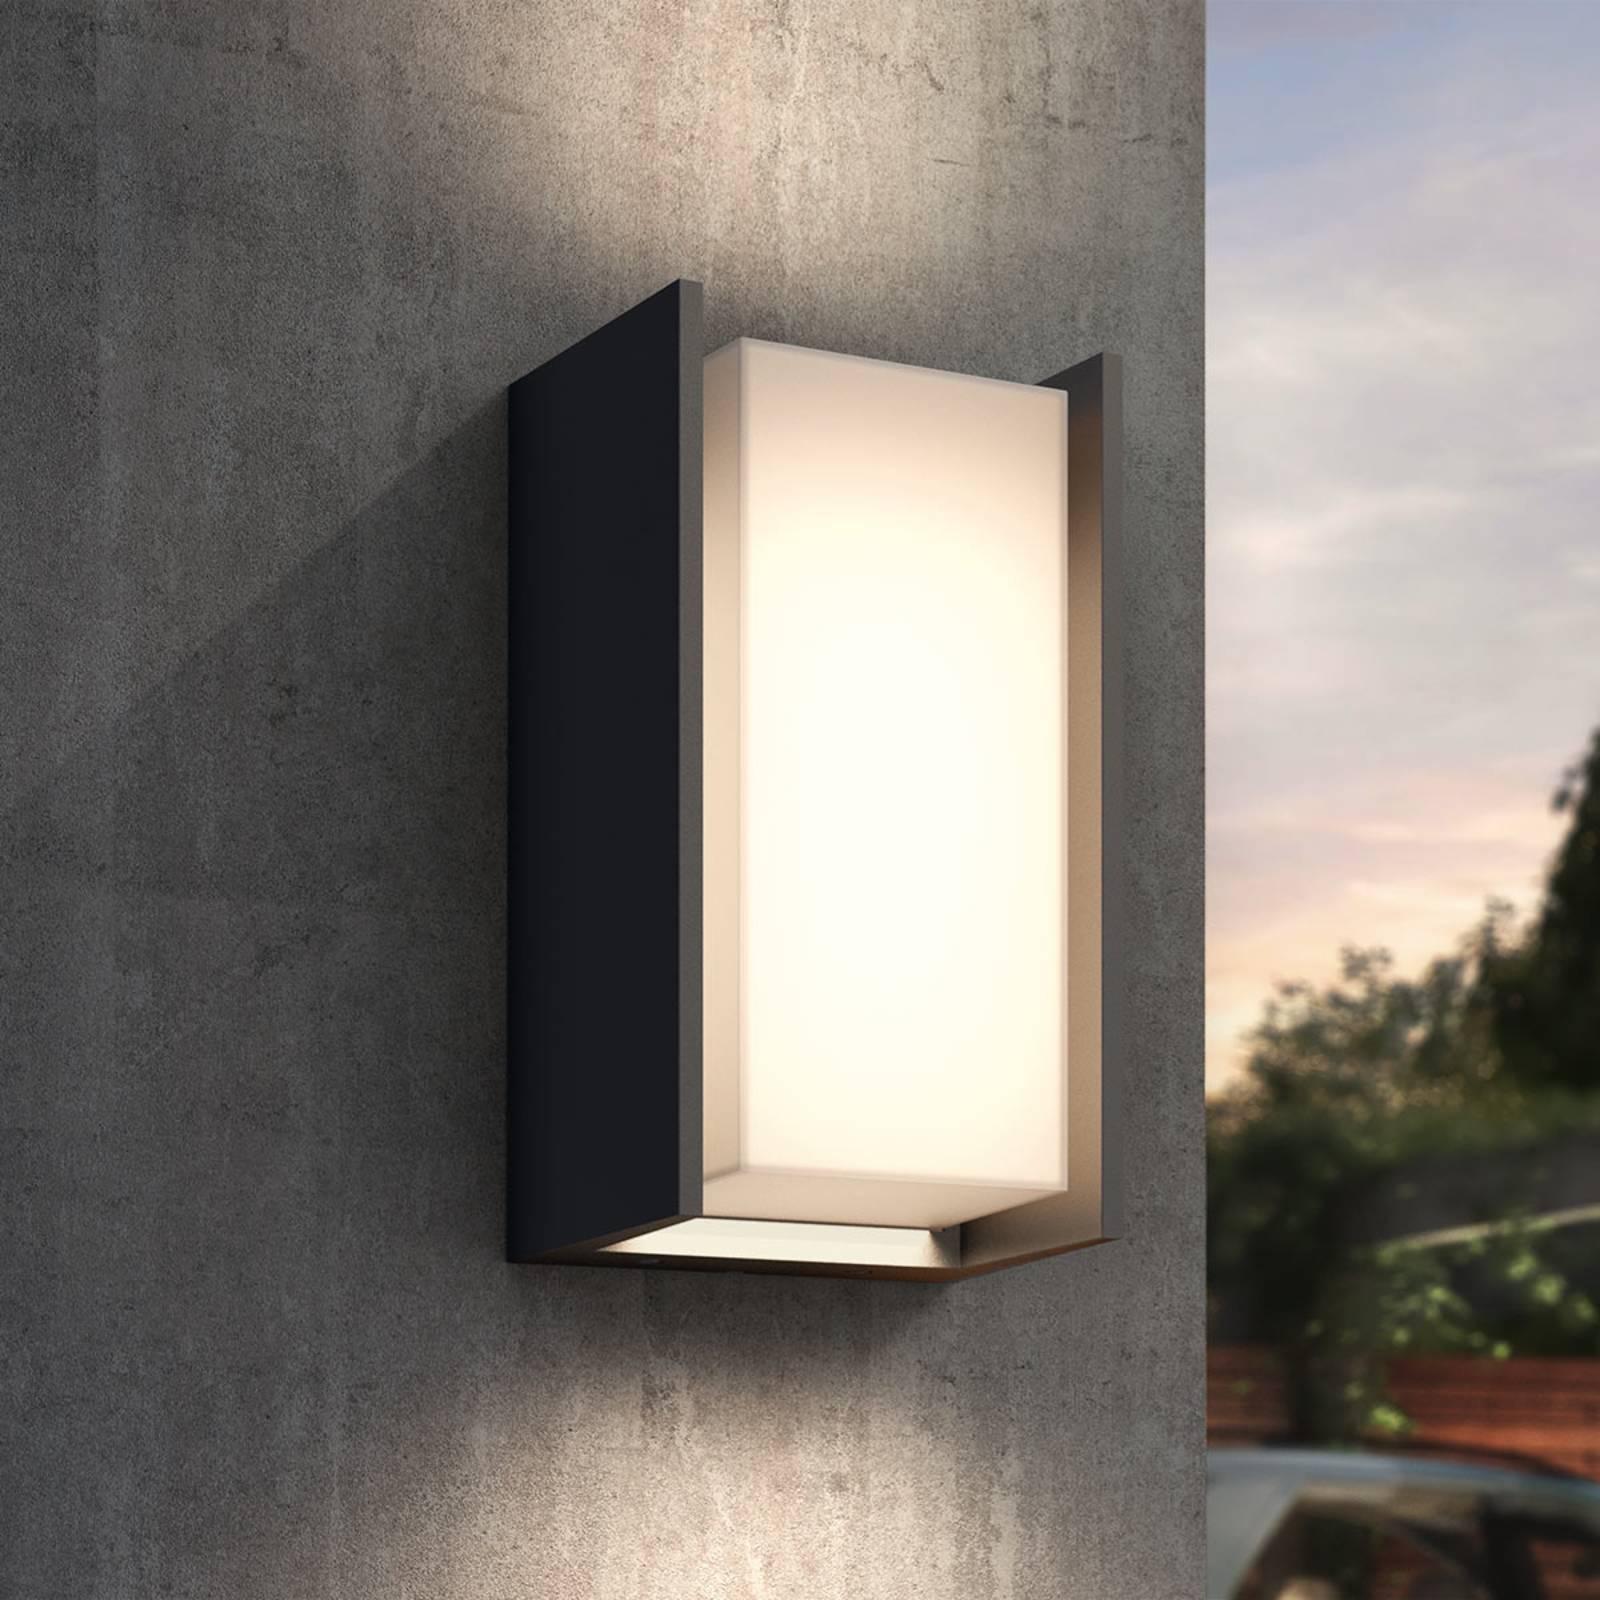 Philips Hue White Turaco LED-Außenwandleuchte